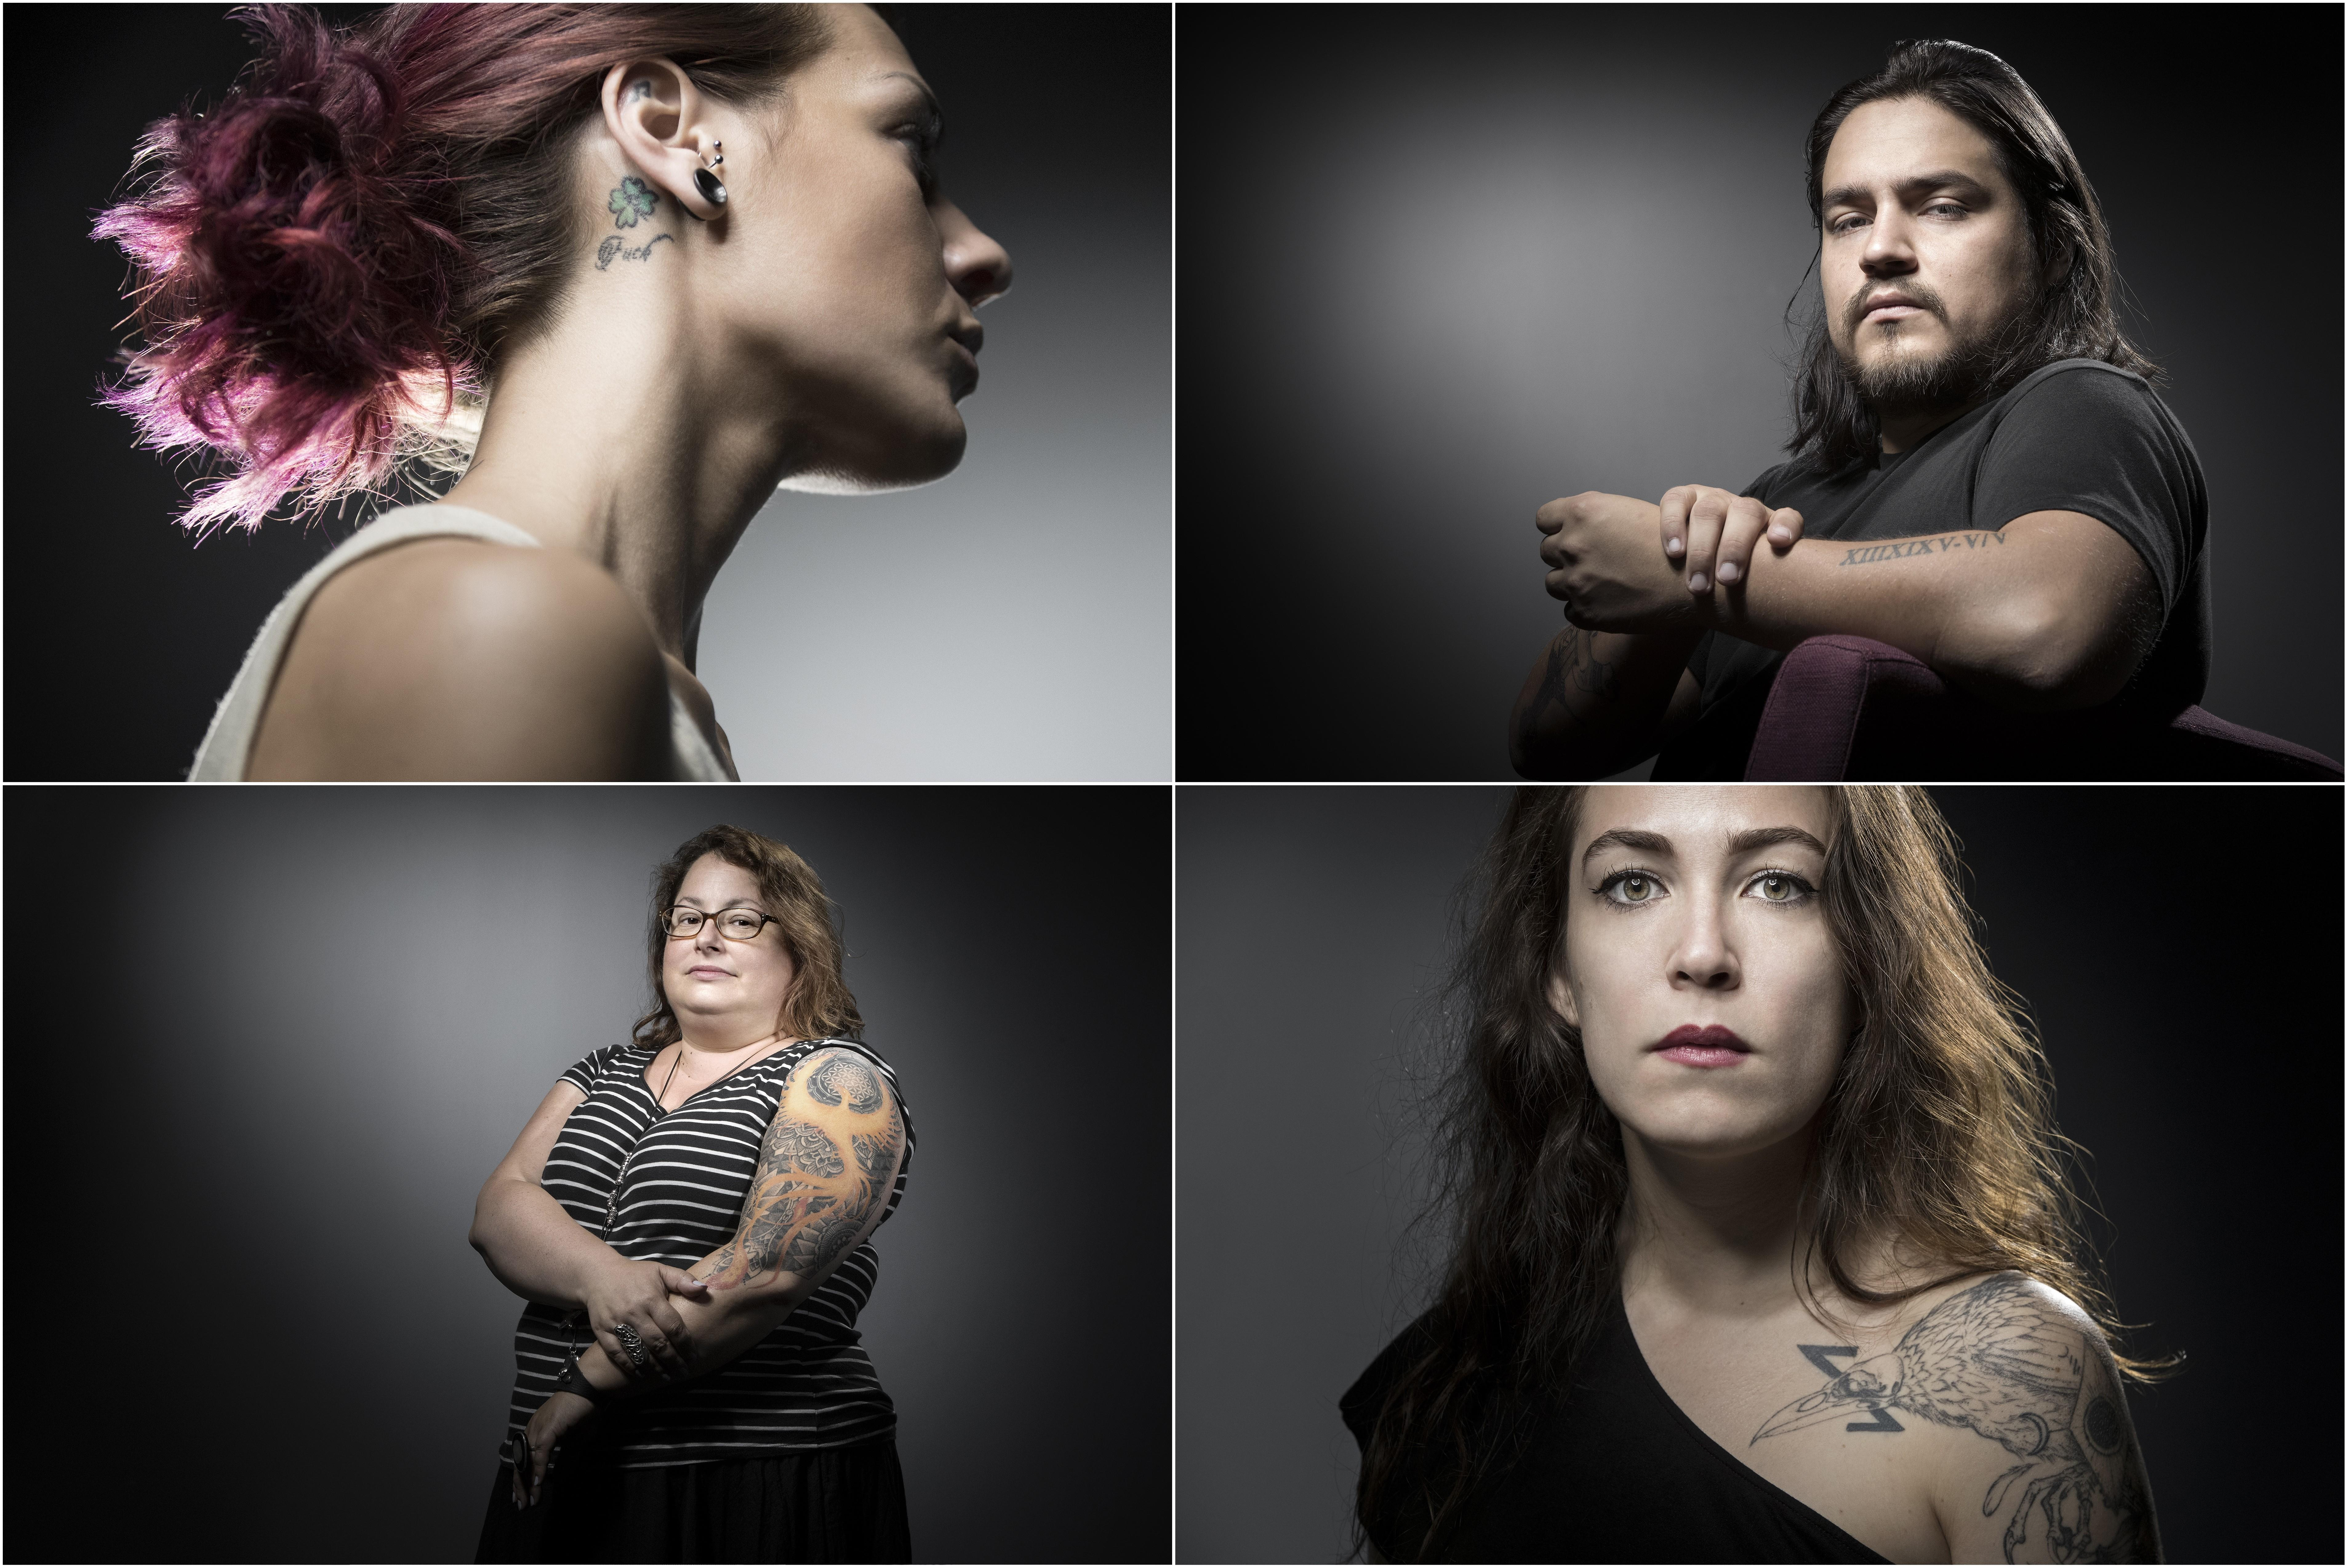 Bataclan, i tatuaggi dei sopravvissuti: